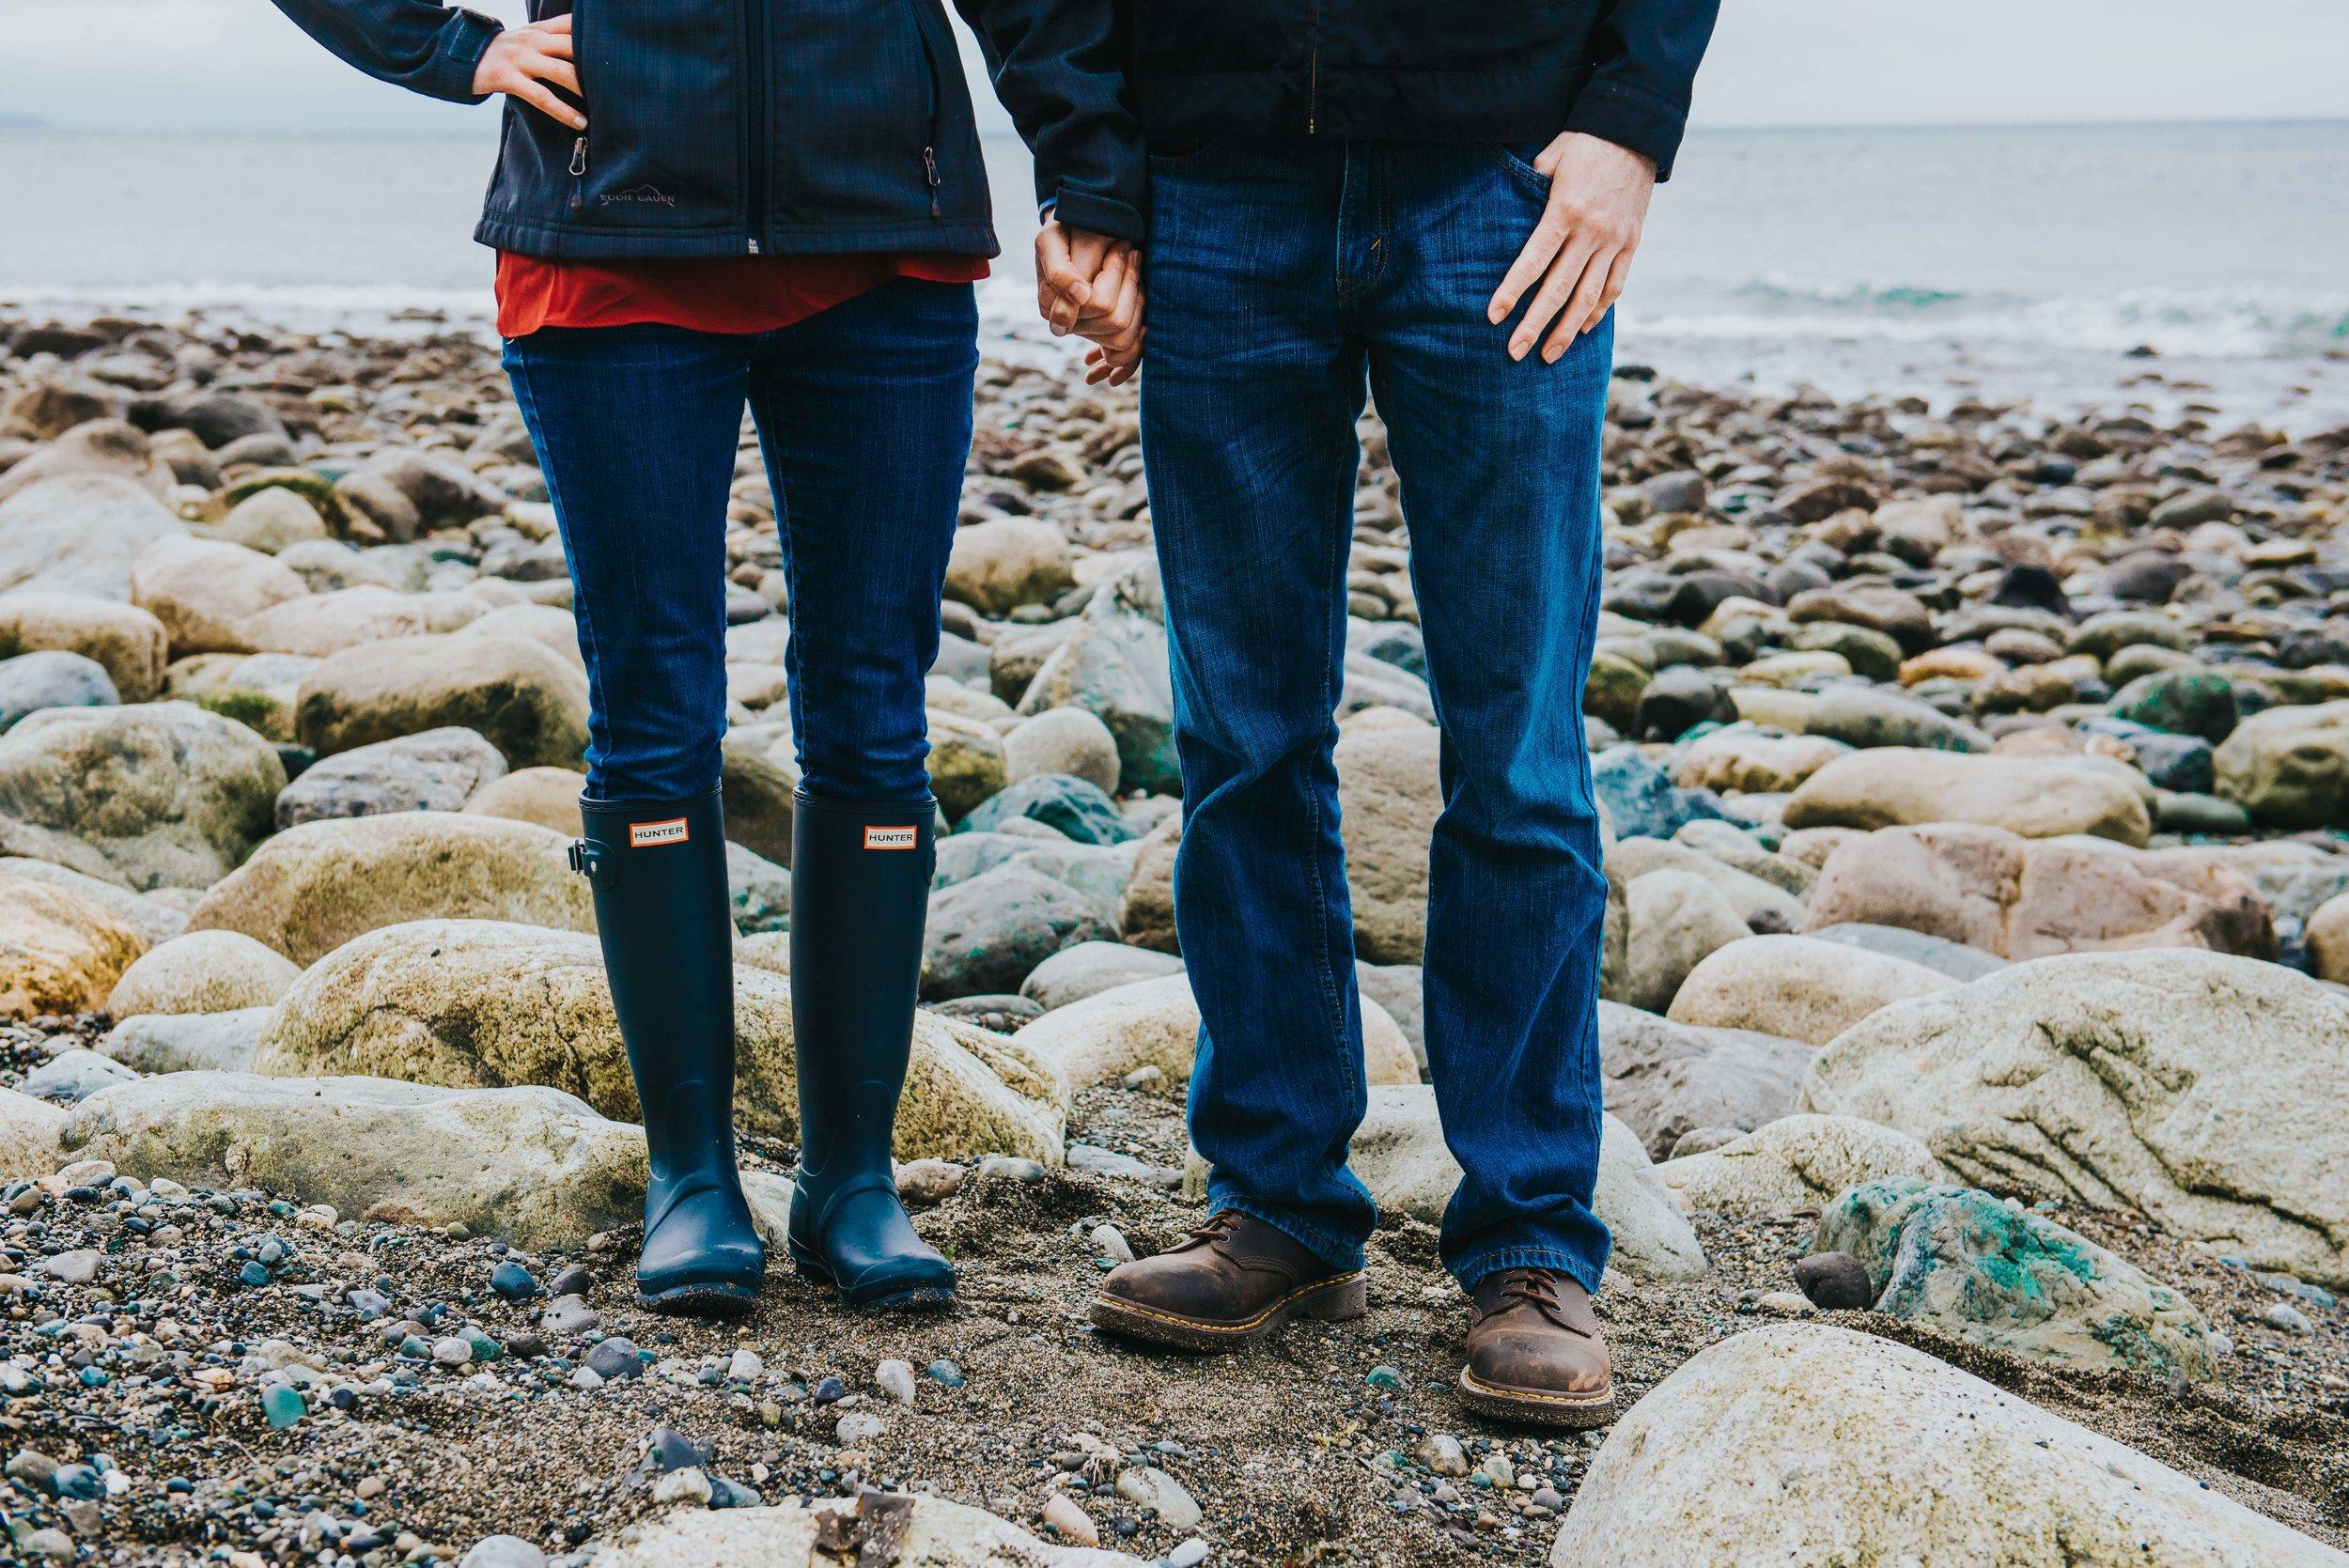 Oak-Harbor-Wedding-Photographer-J-Hodges (29 of 34).jpg